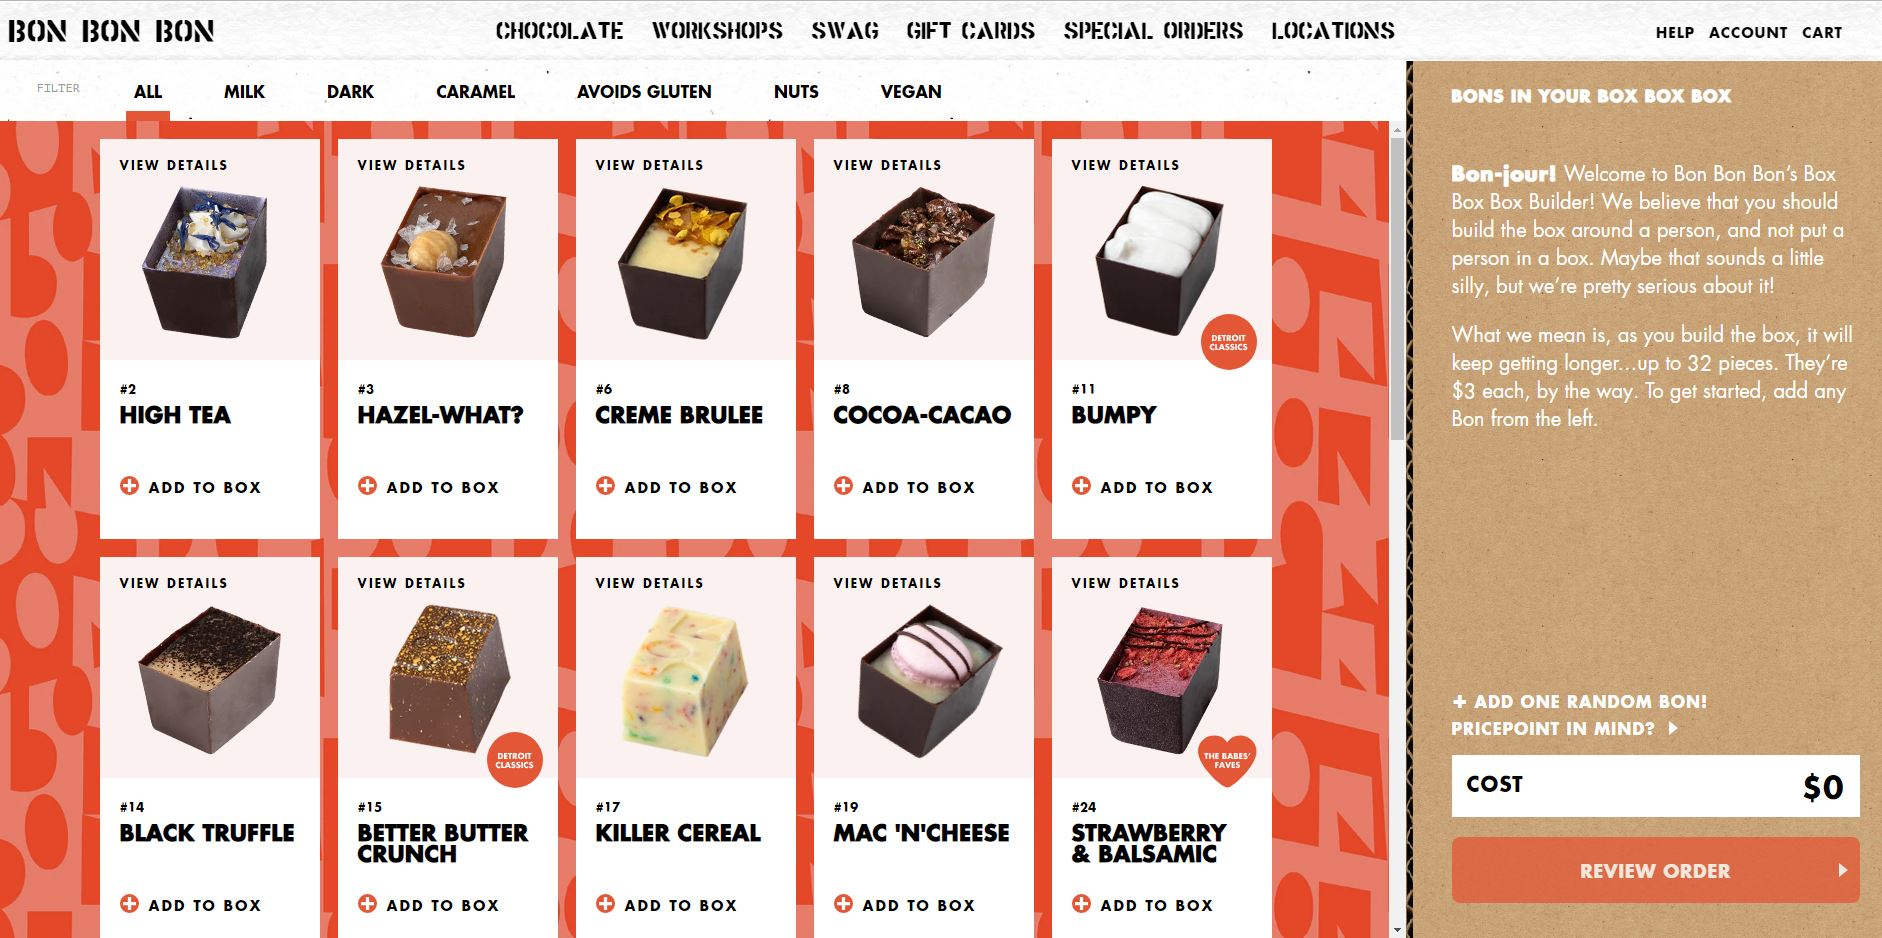 bonbonbon beste webshops